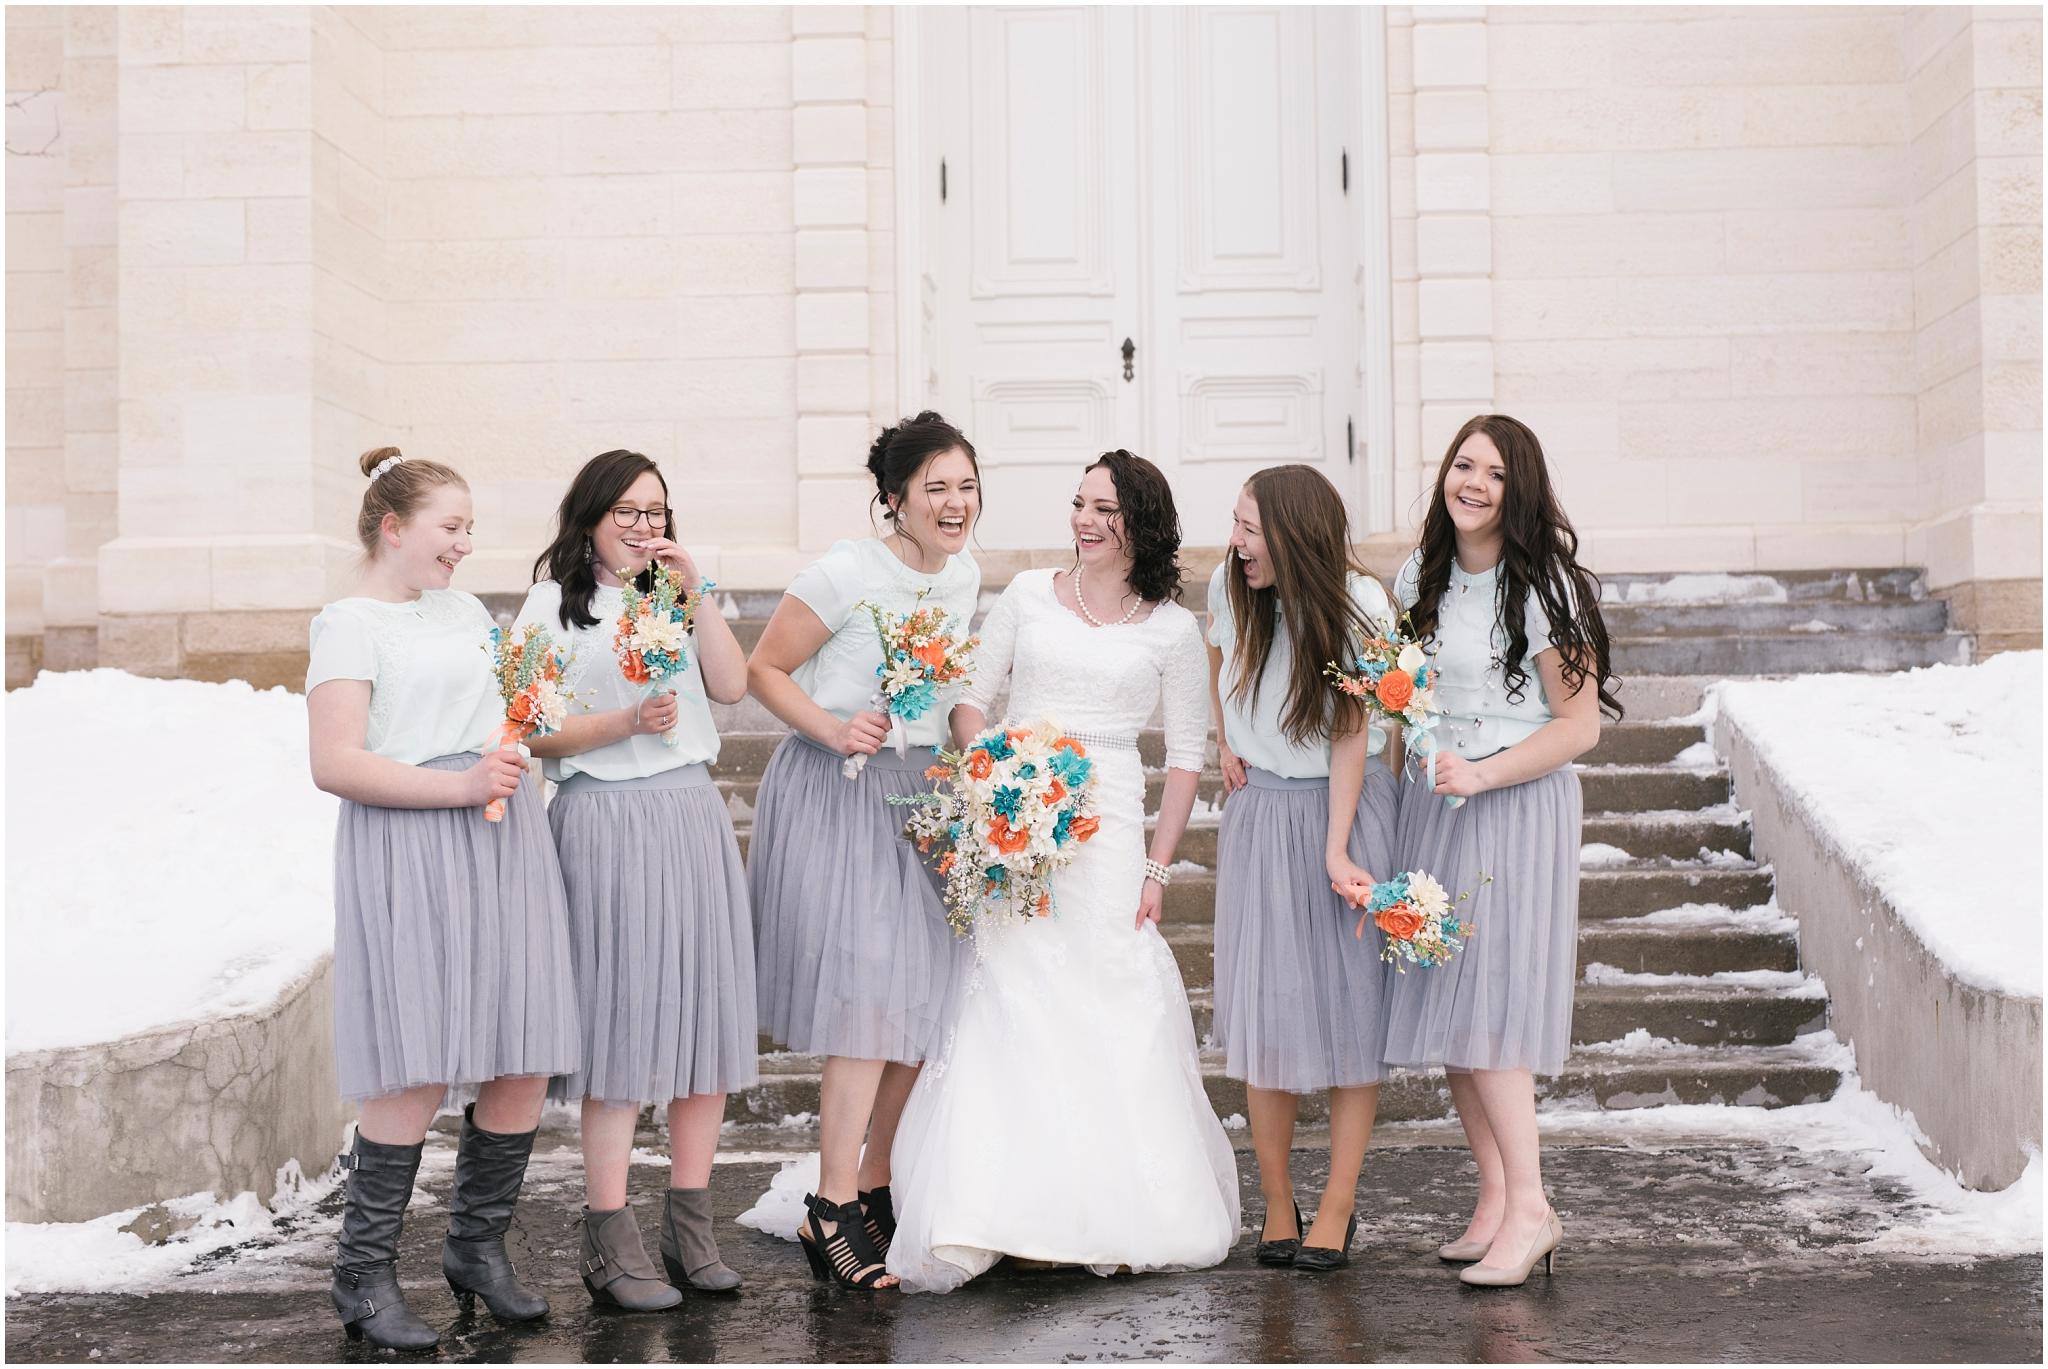 Bo Alyssa Wedding-95_Lizzie-B-Imagery-Utah-Wedding-Photographer-Central-Utah-Photographer-Utah-County-Manti-Temple.jpg